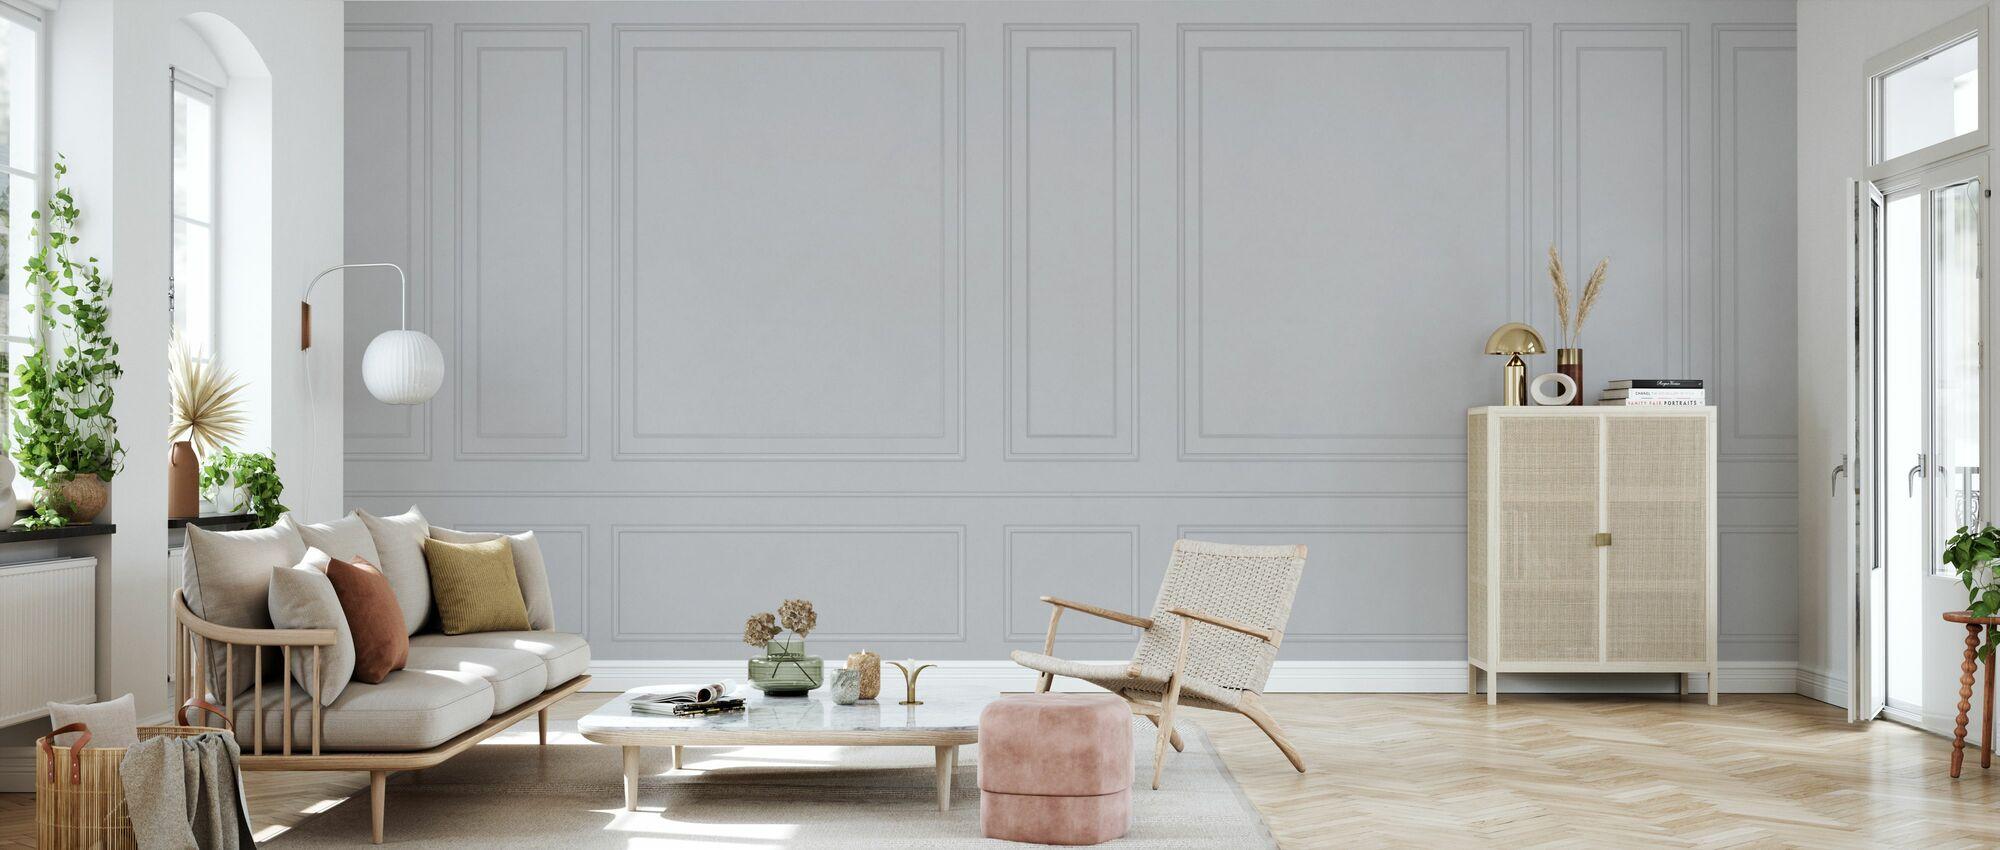 Voguish Wall Panel - Gray - Wallpaper - Living Room